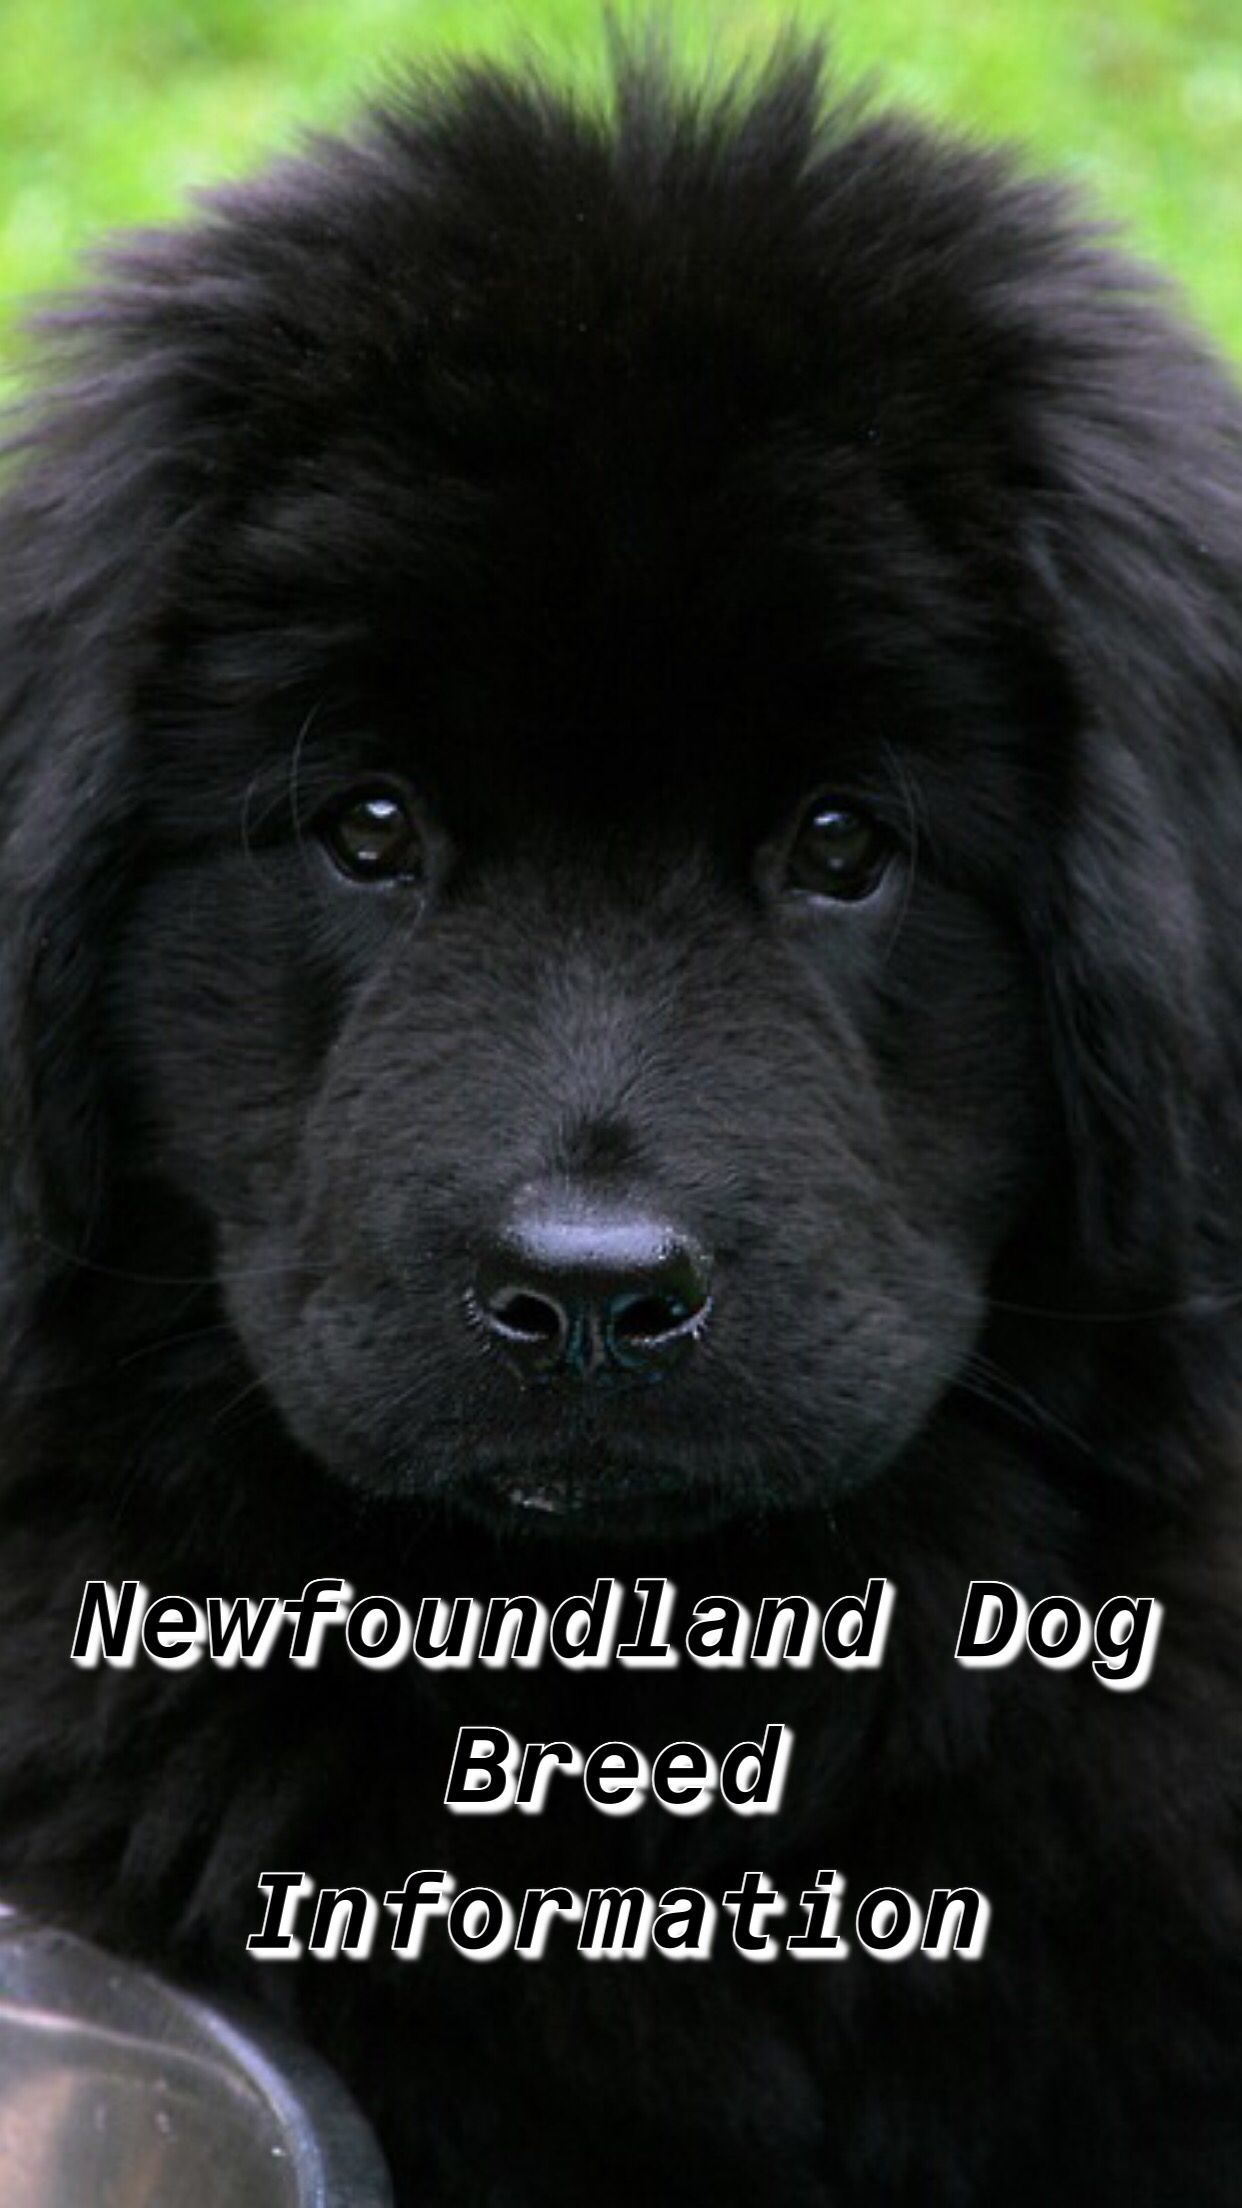 newfoundland newfoundland puppies landseer newfoundland